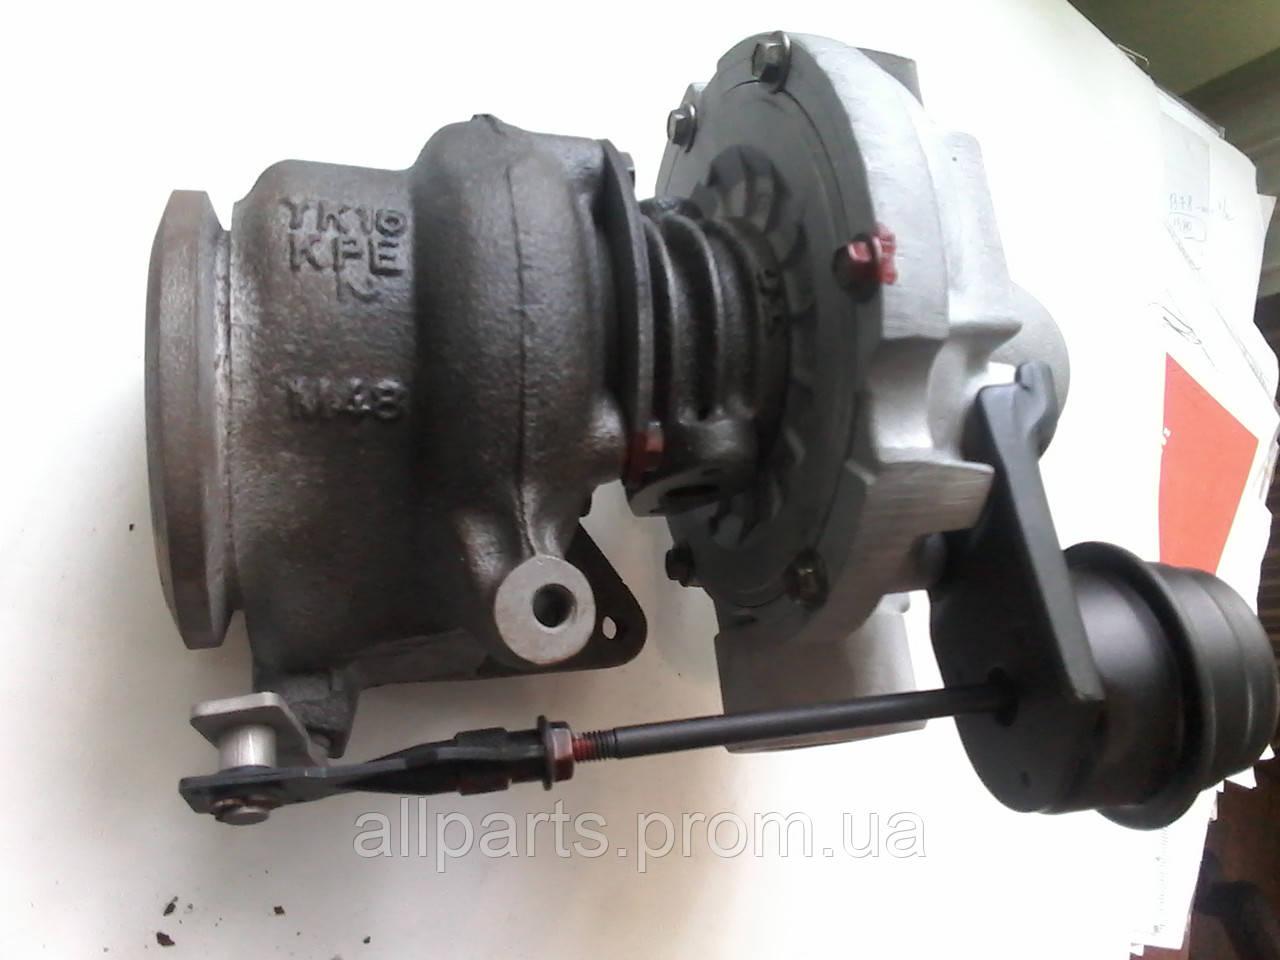 Турбина на Renault Trafic 2.0DCI, производитель - Garrett 762785-5004S